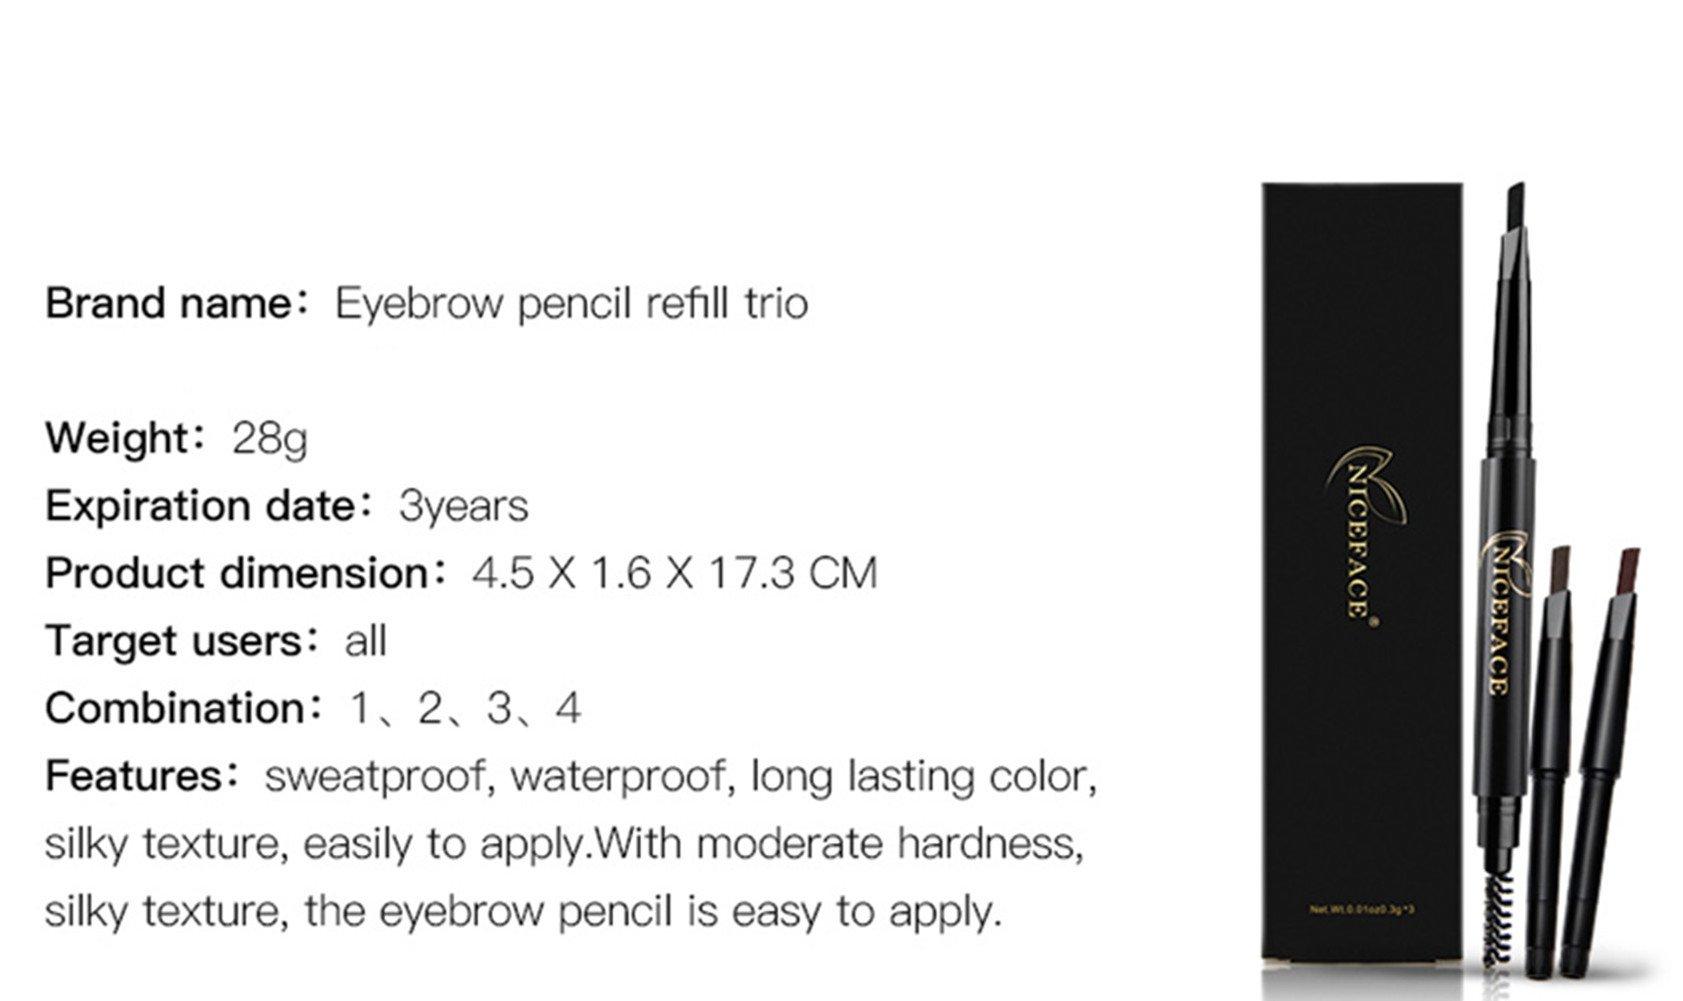 Eyebrow Pencil Eye Brow Brush with 3 Colors Replaceable Brow Pencil Waterproof Double-Headed Pencil, Black, Dark Brown, Light Brown (Black, Coffee, Gray)